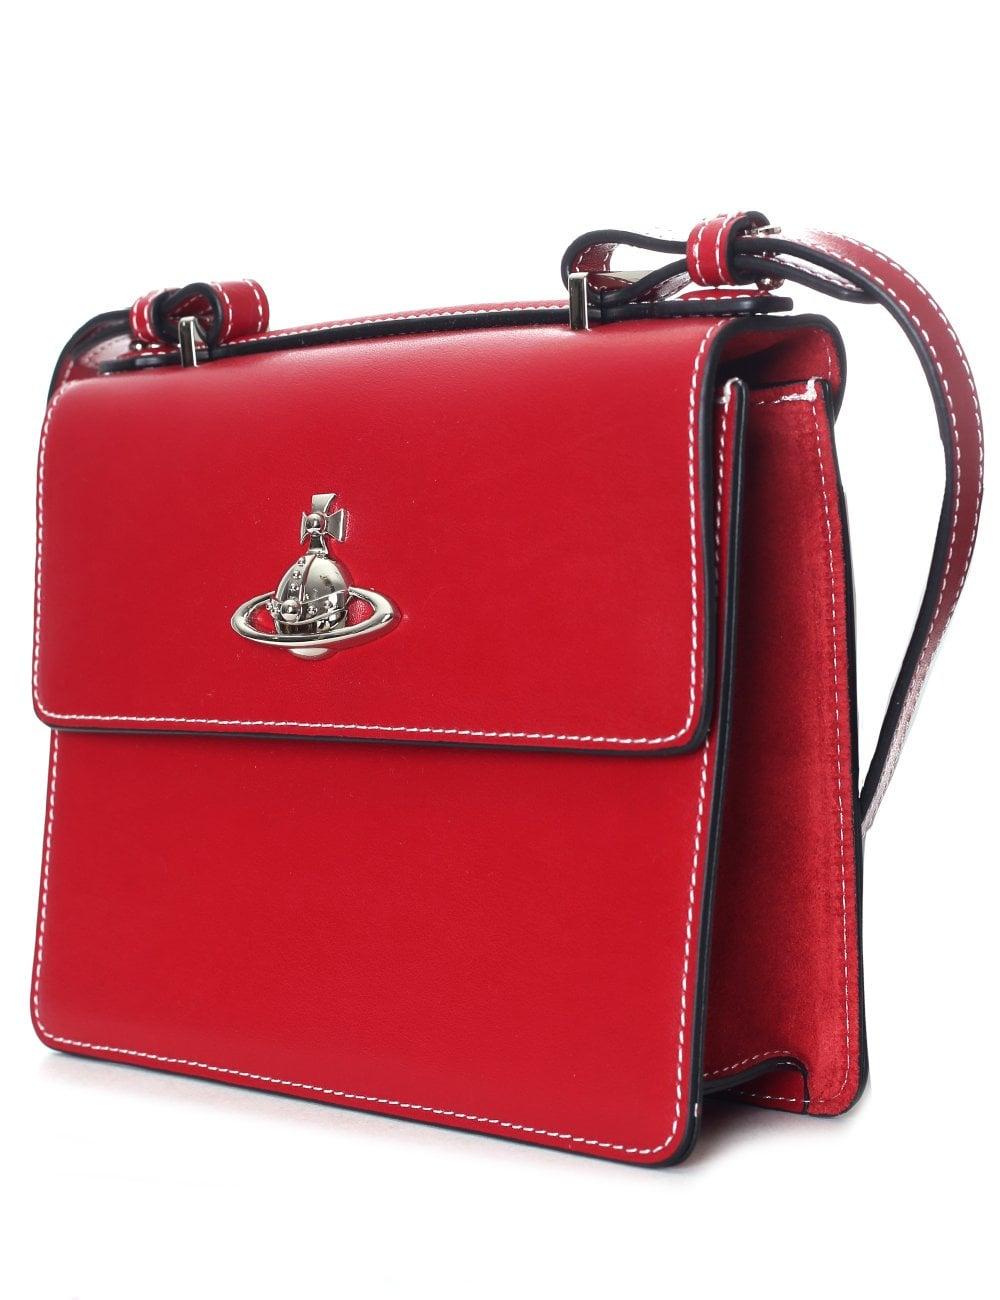 Vivienne Westwood Women s Matilda Medium Shoulder Bag 670fa6a43691e